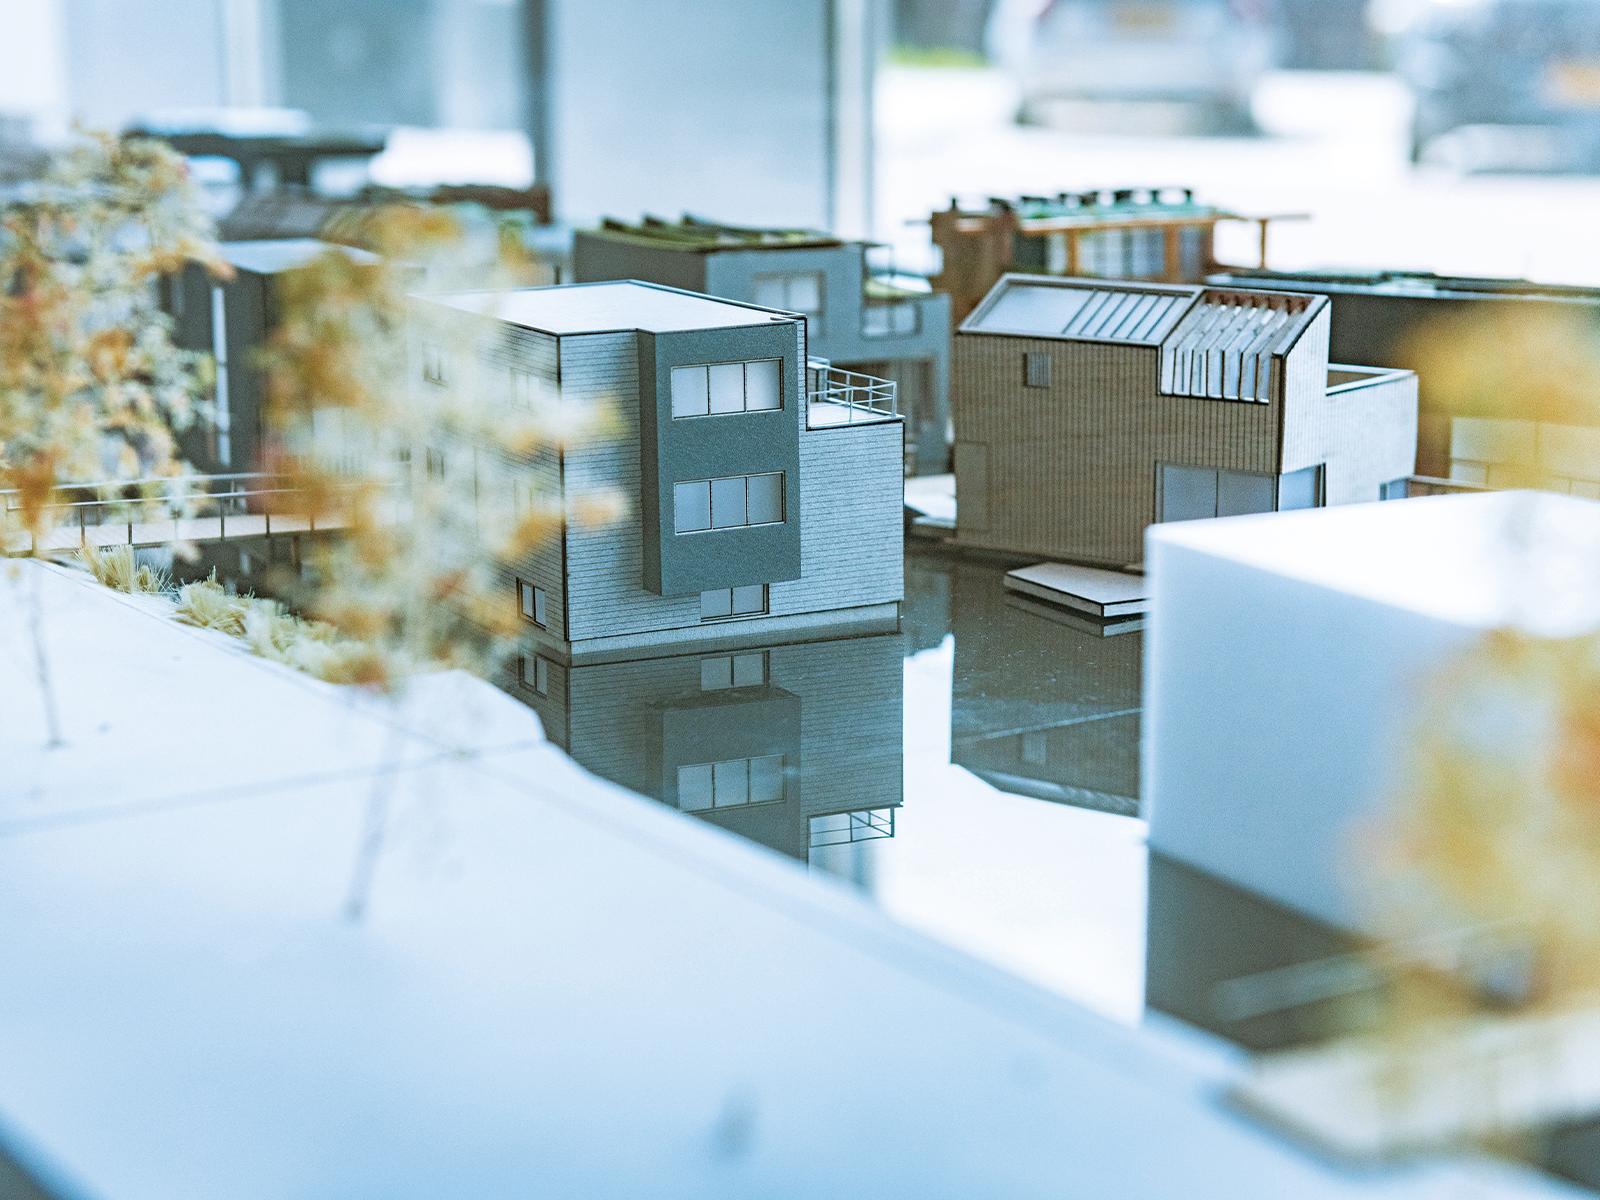 『Space & Matter』のオフィスに置かれていた「Schoonschip」の模型。夢のような水上都市が現実になった。